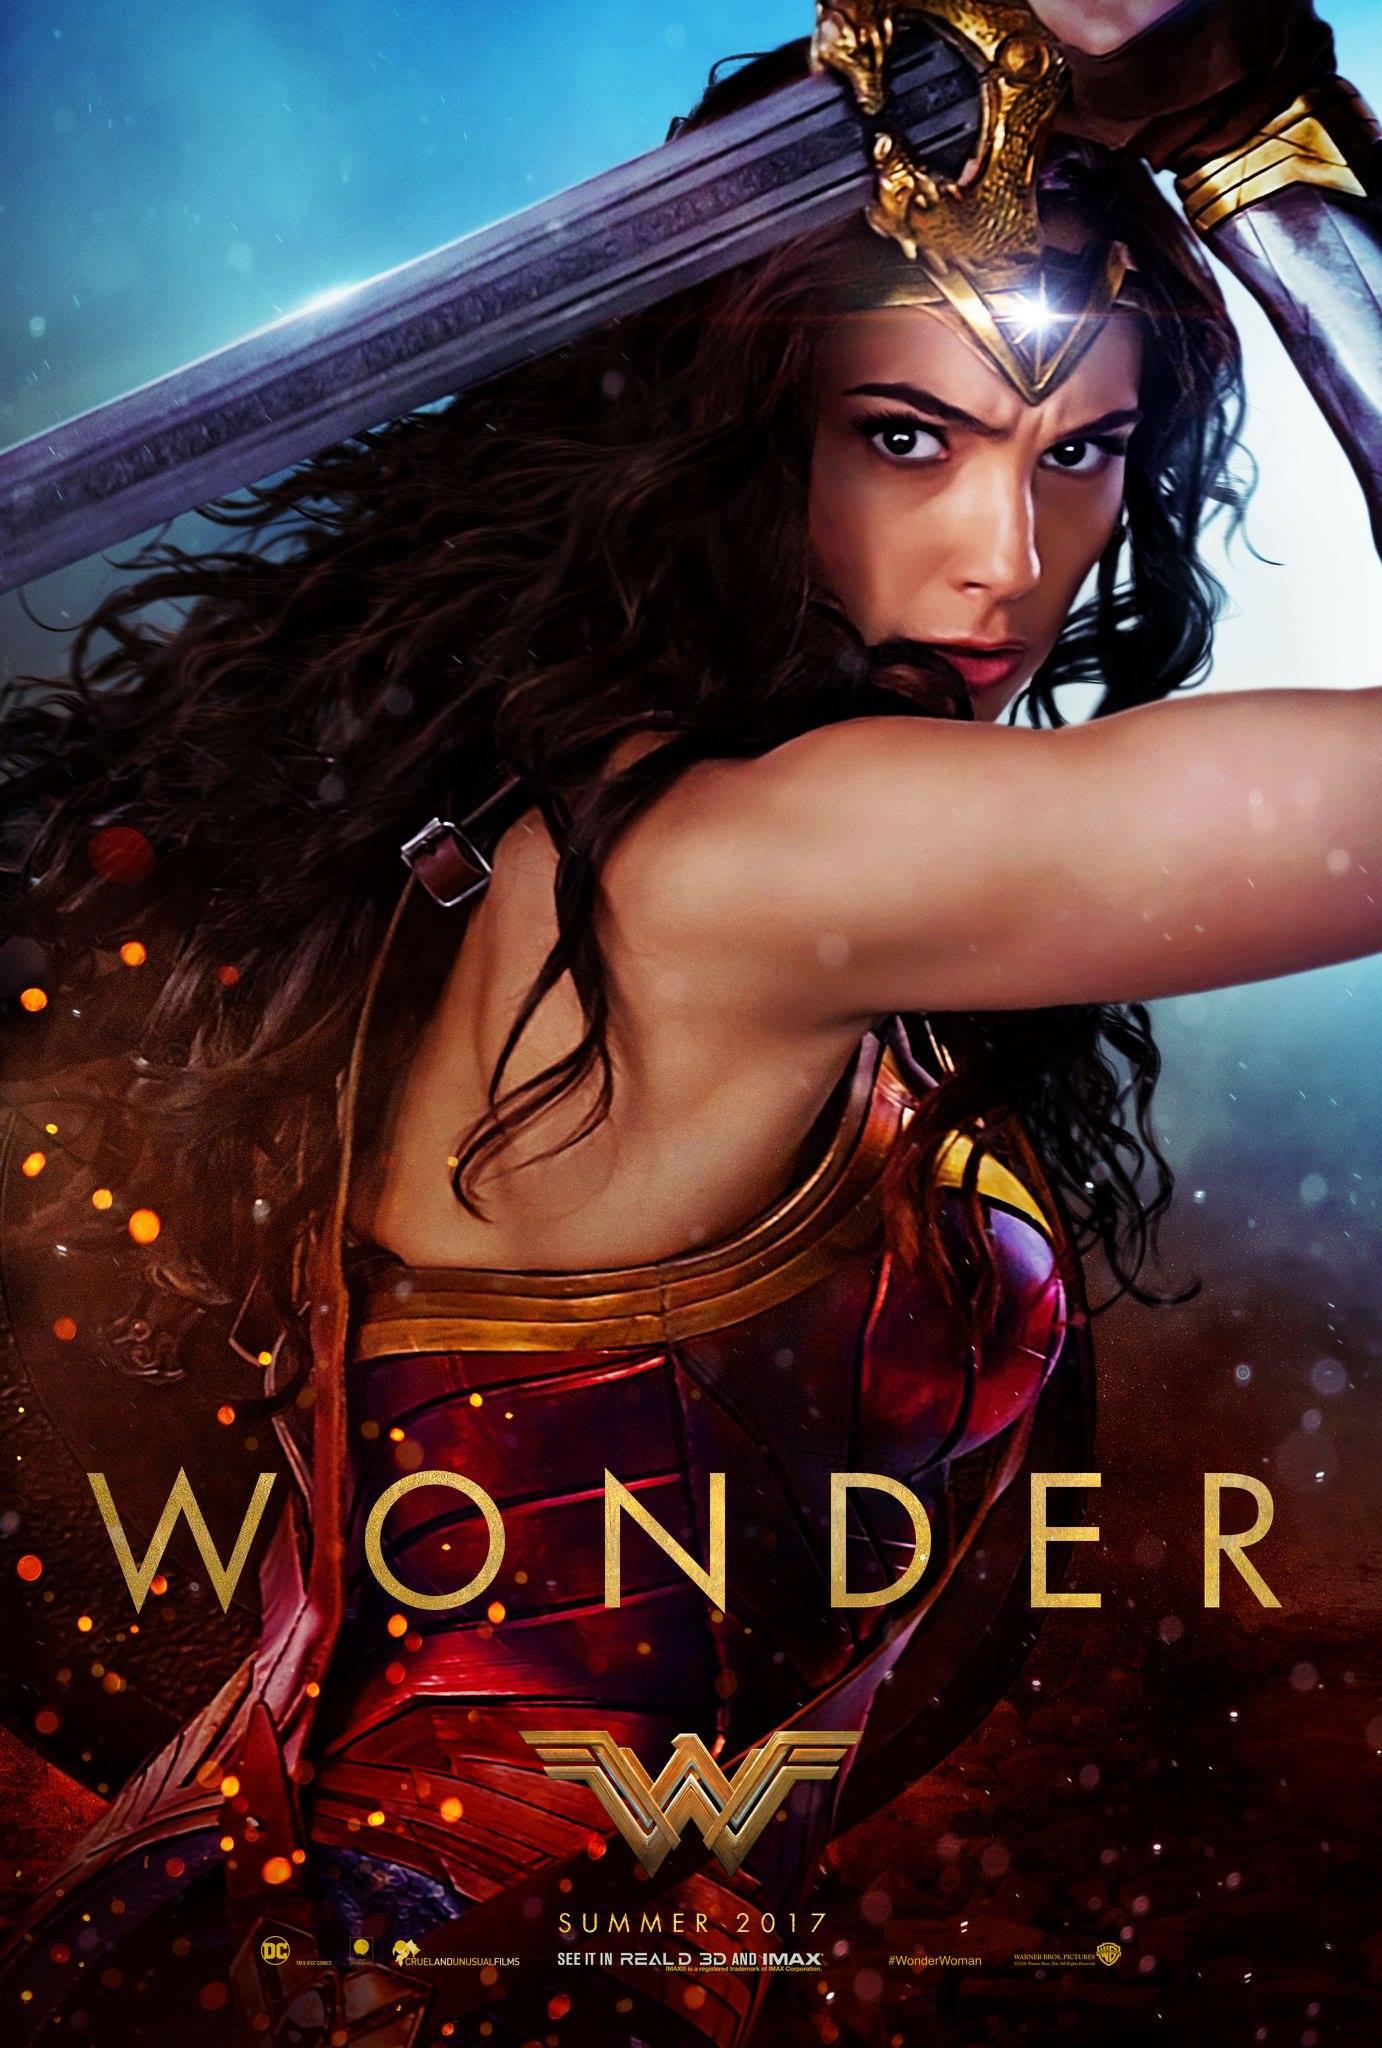 Wonder Woman Trailer Poster 1